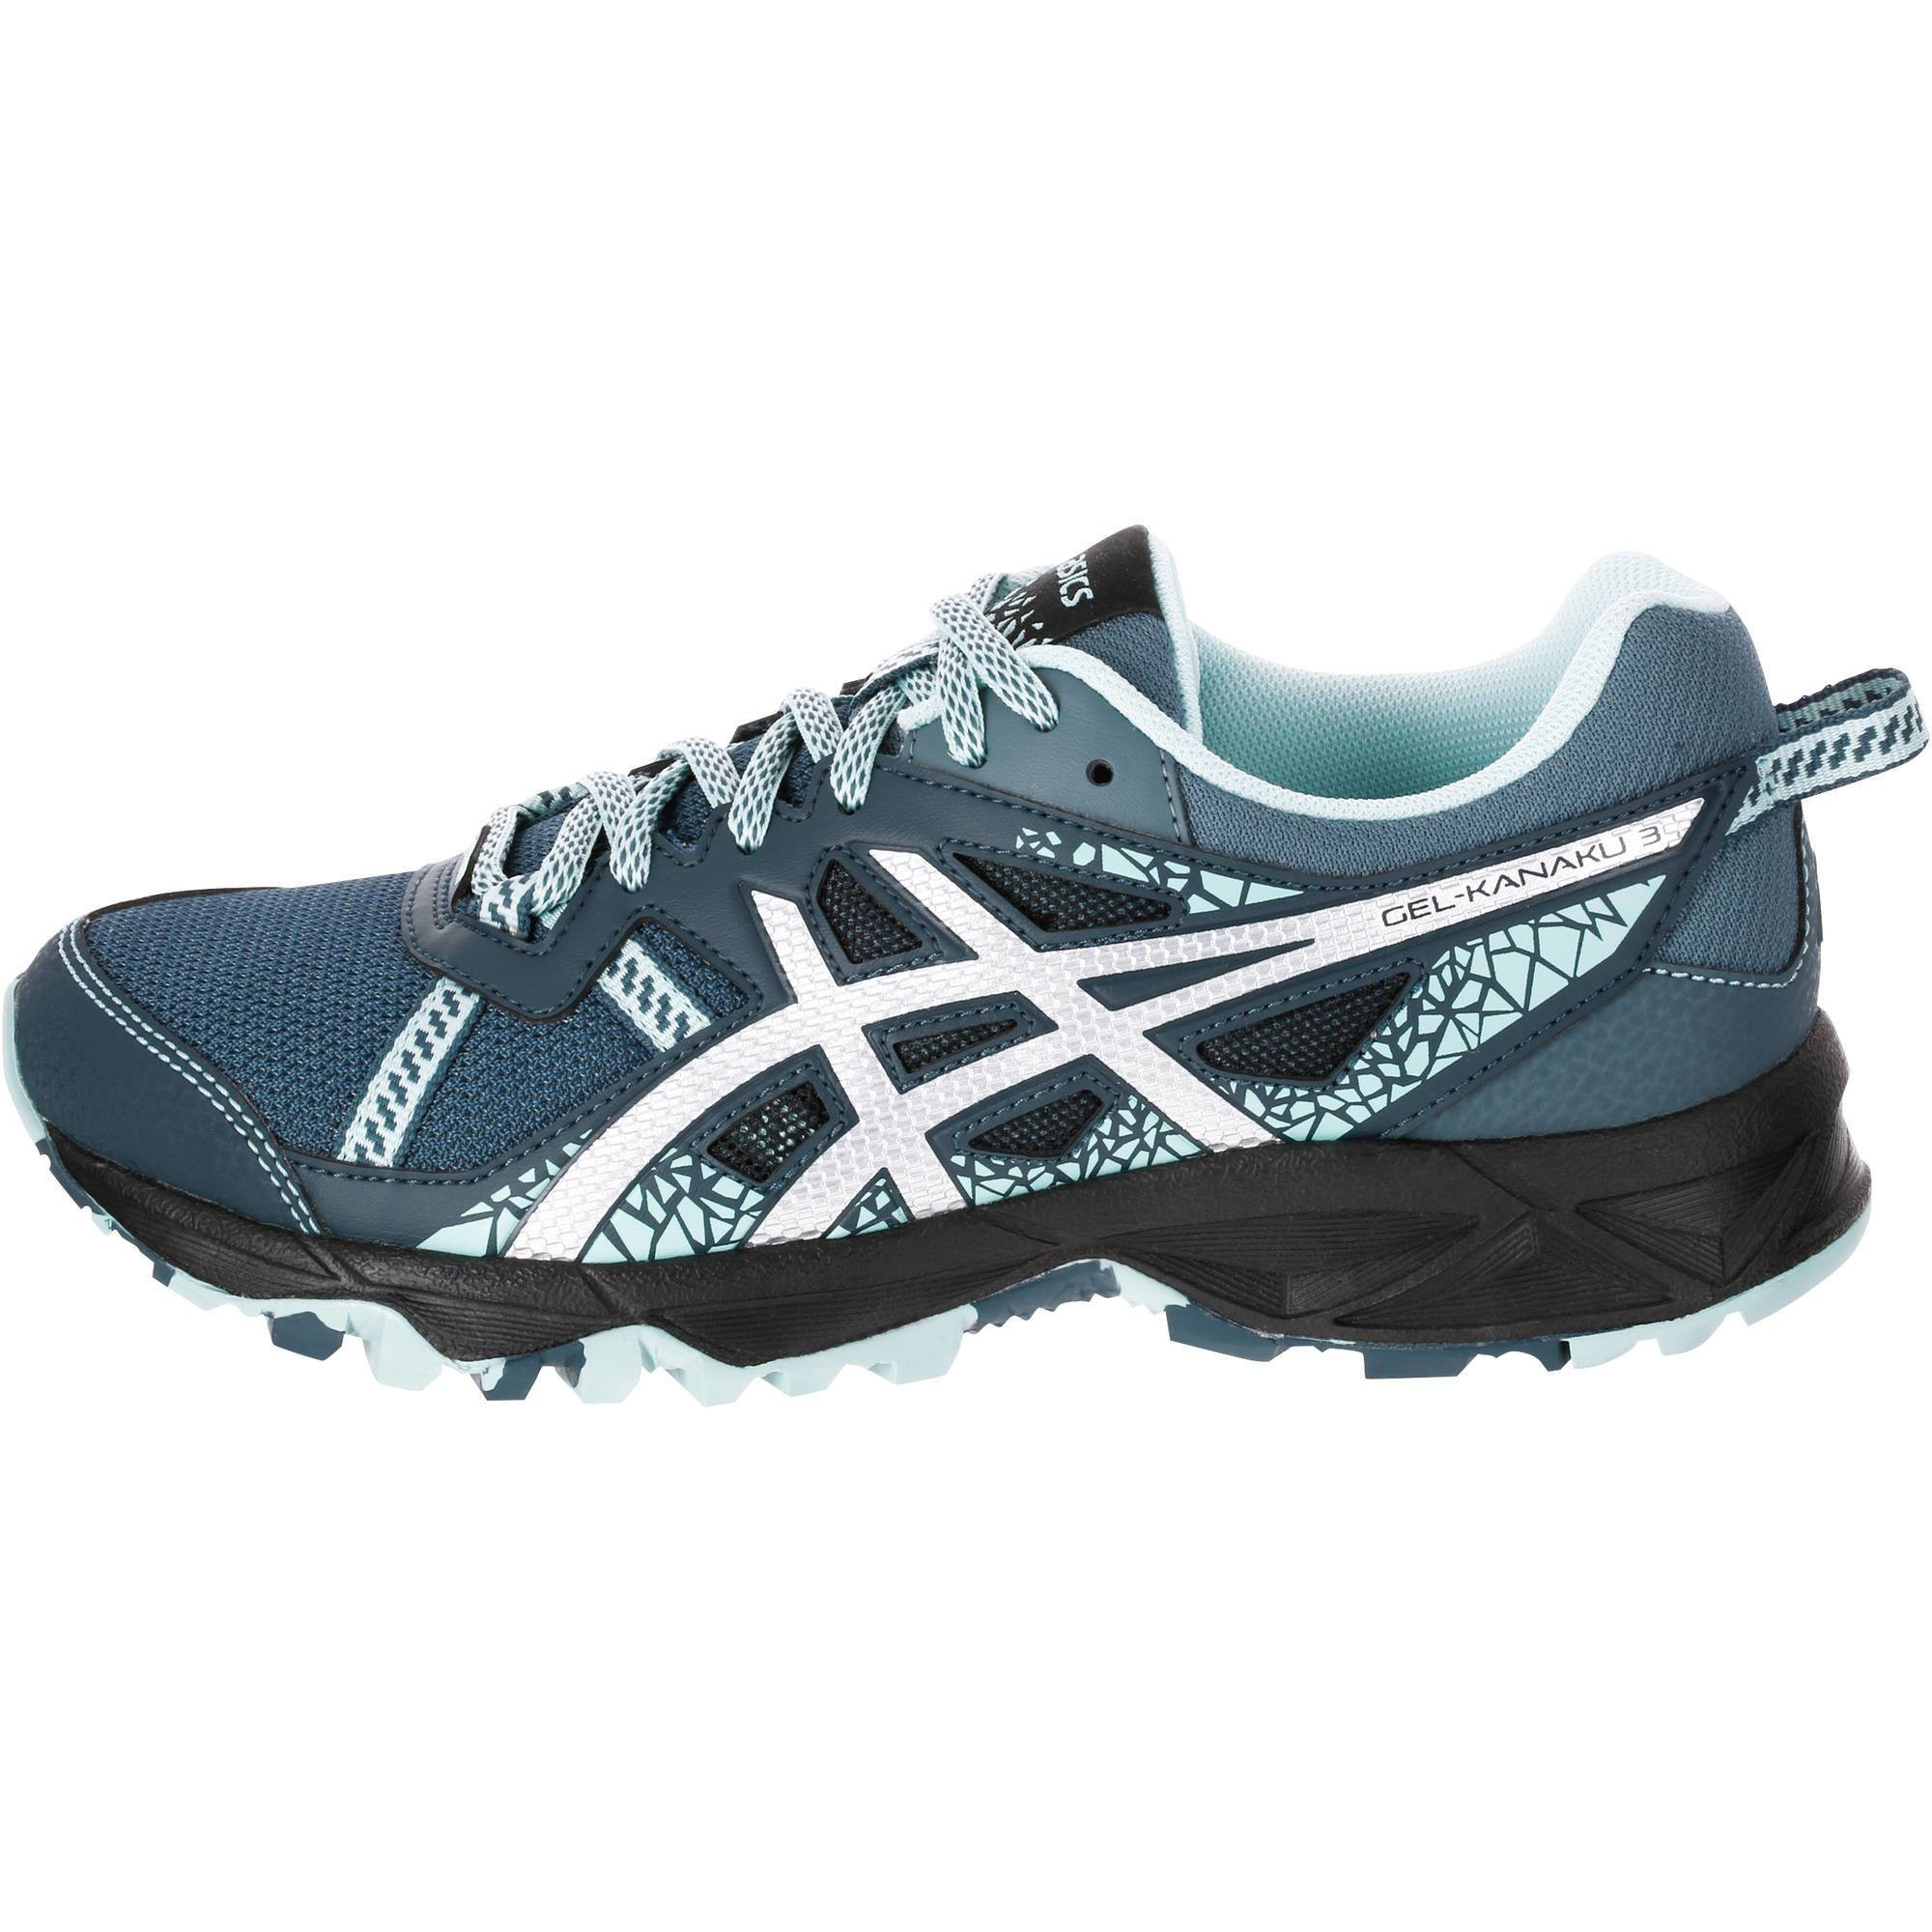 chaussures running gel kanaku asics asics